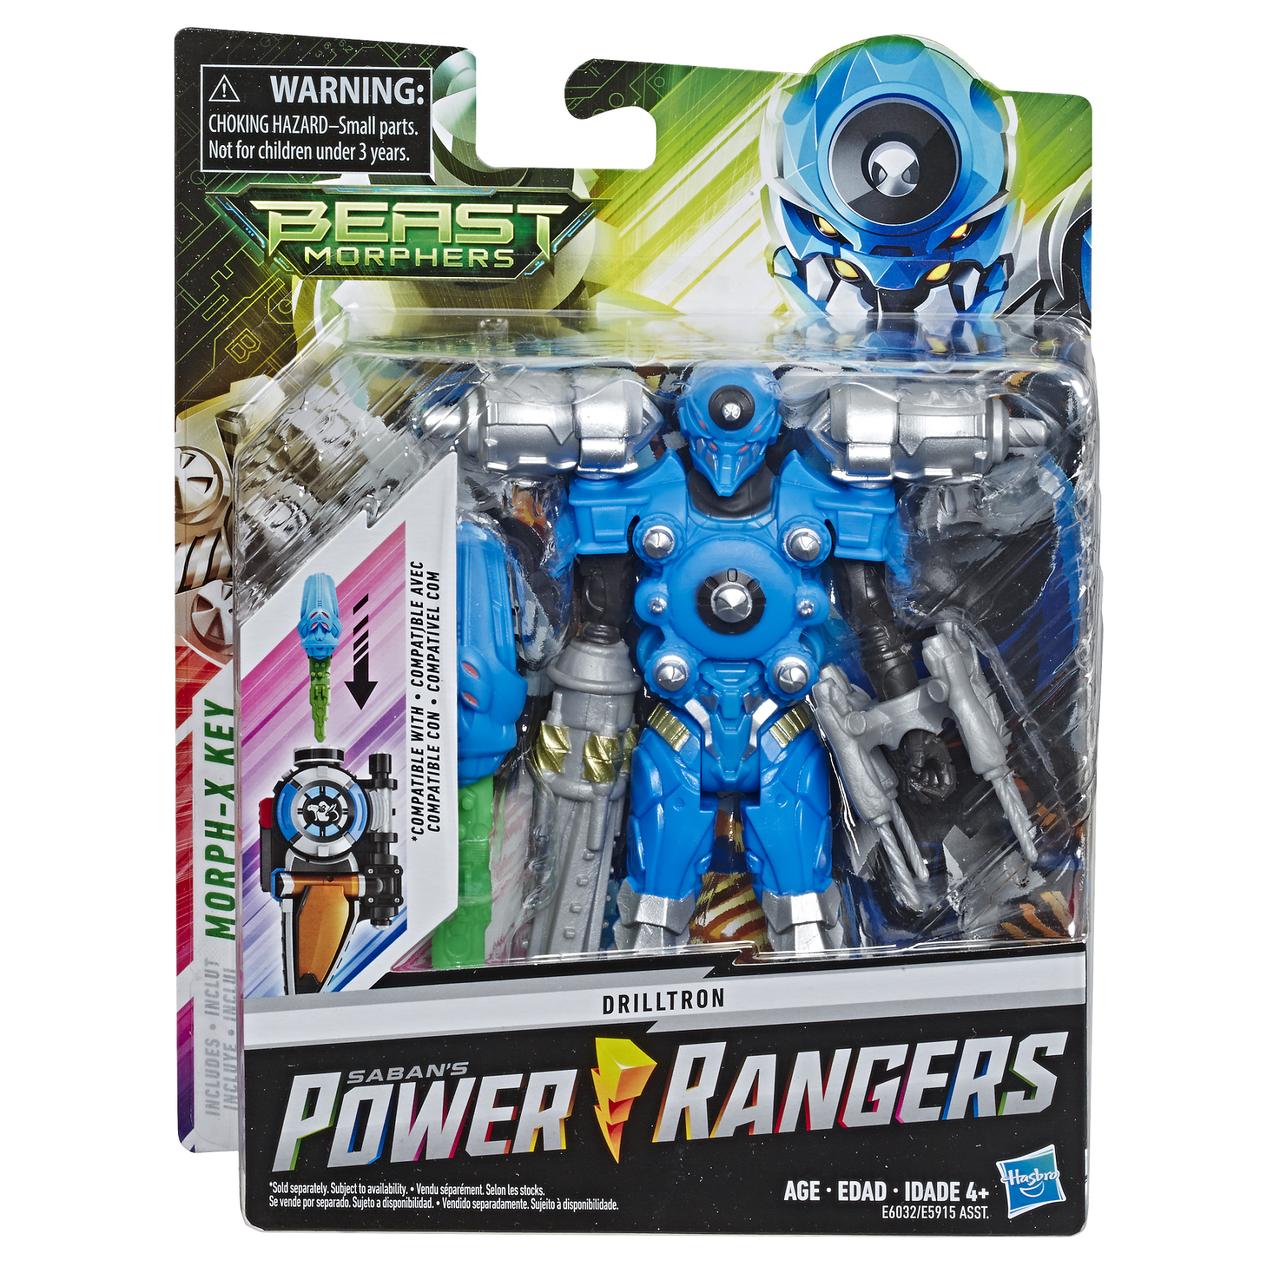 Игровая фигурка Hasbro Могучие Рейнджеры, 15 см DRILLTRON (E5915_E6032)